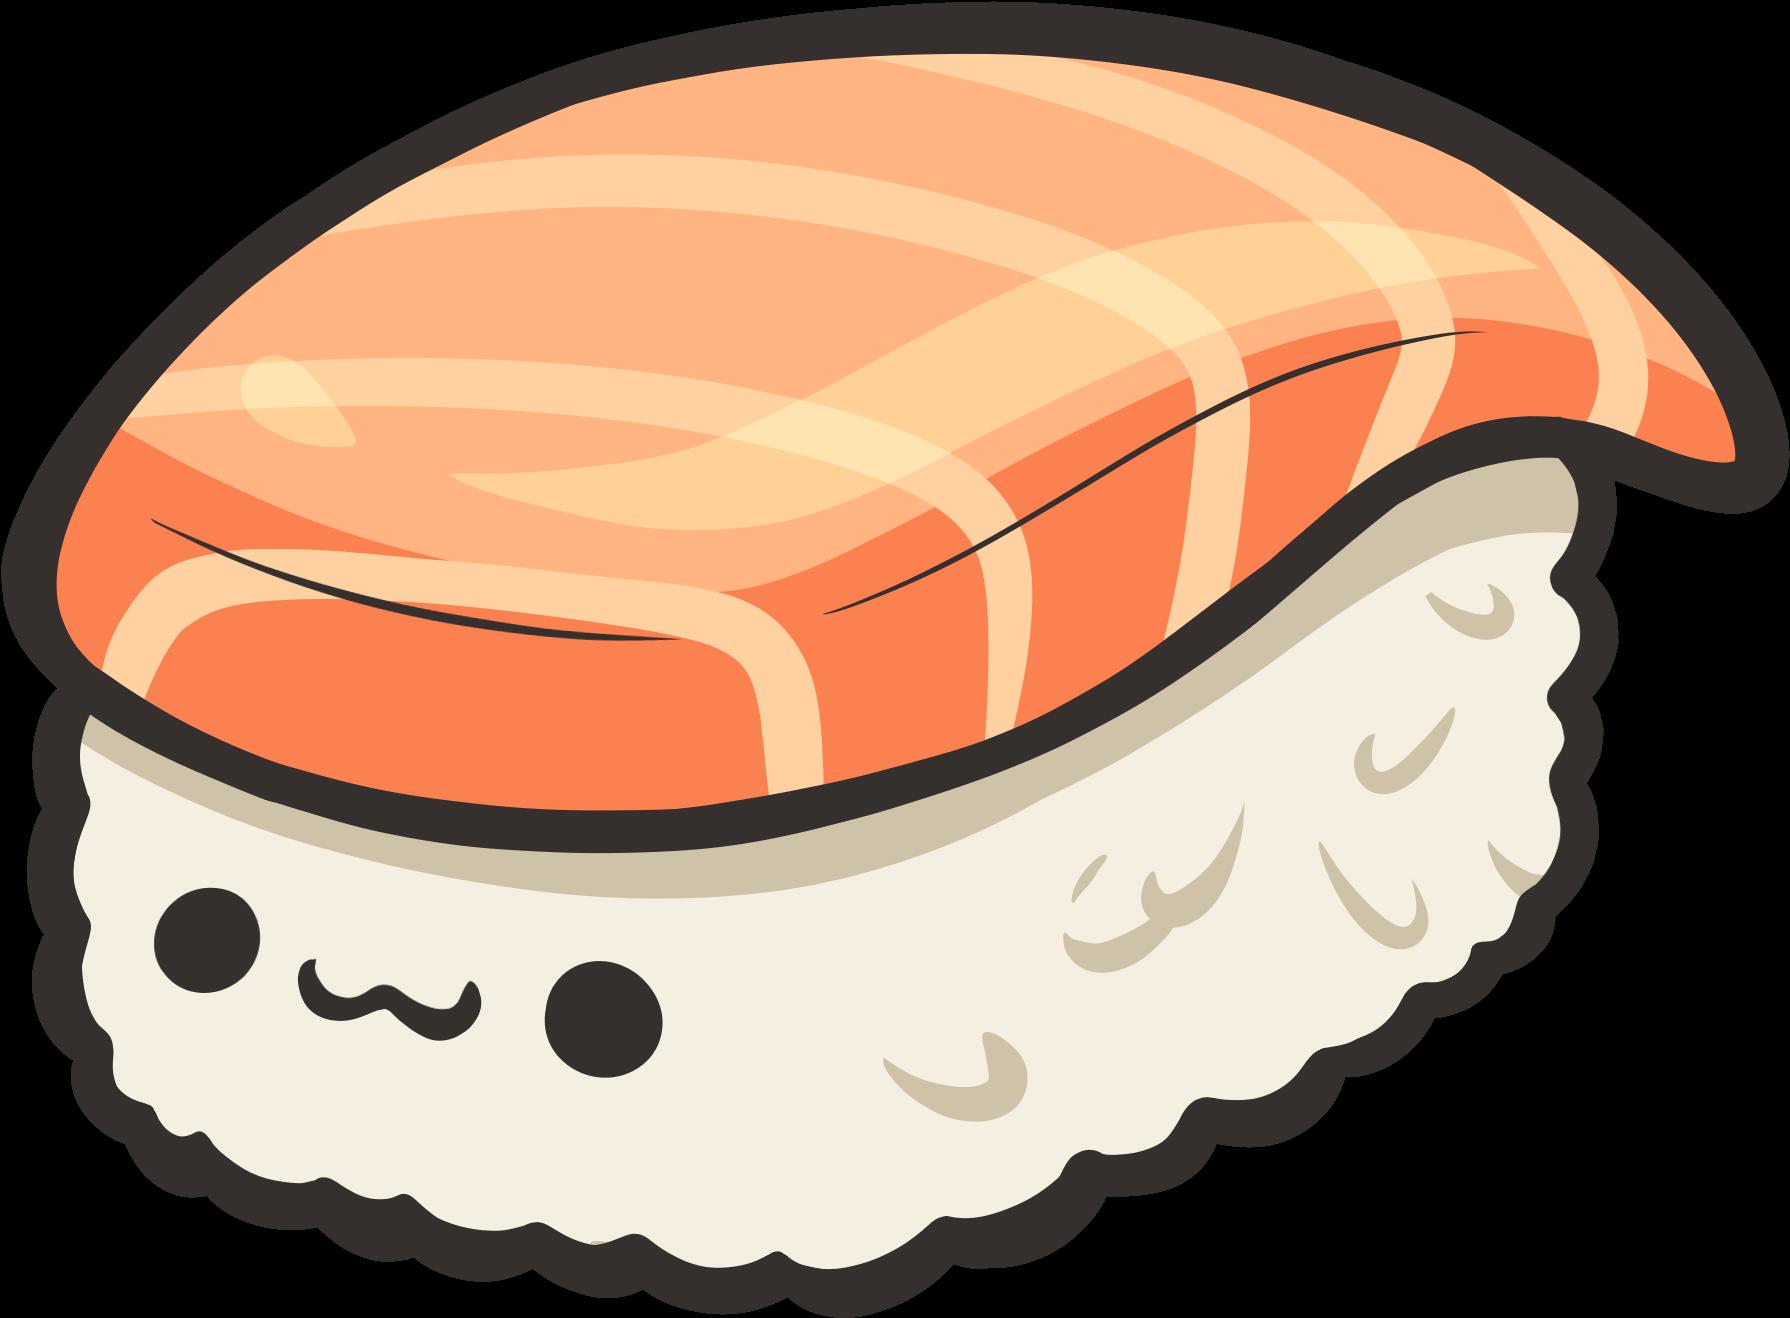 Sushi Draw Kawaii Transparent Cartoon Jing Fm